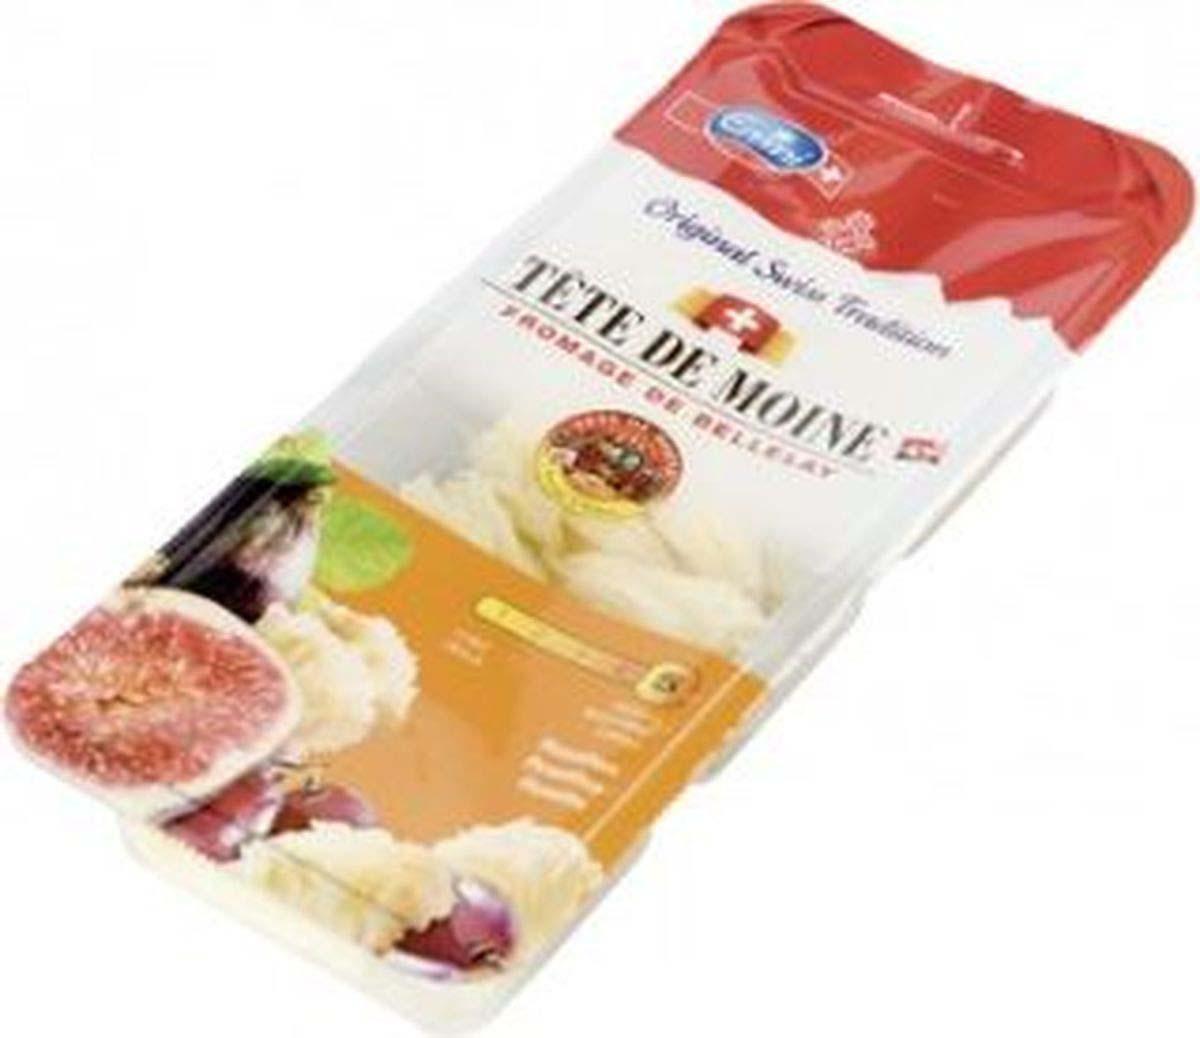 Сыр Emmi Тет де Муан полутвердый, розочки, 51%, 100 г сыр emmi фондю эмми 40% 400 г